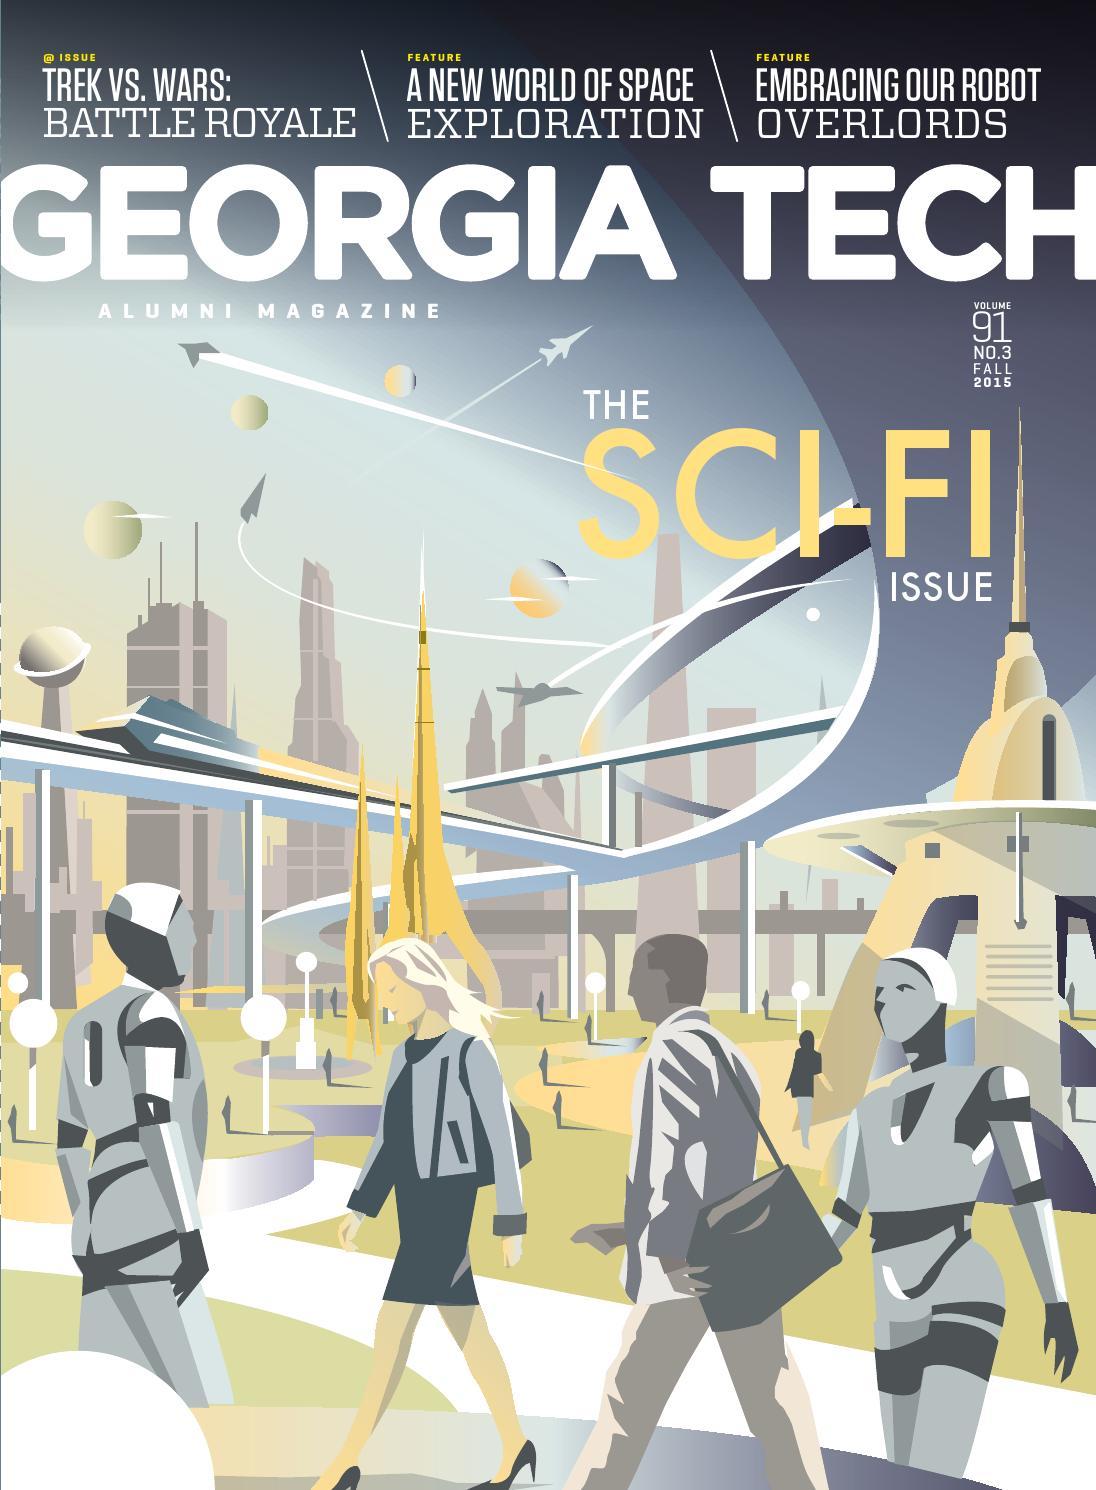 Georgia Tech Alumni Magazine Vol 91 No 3 2015 By Association